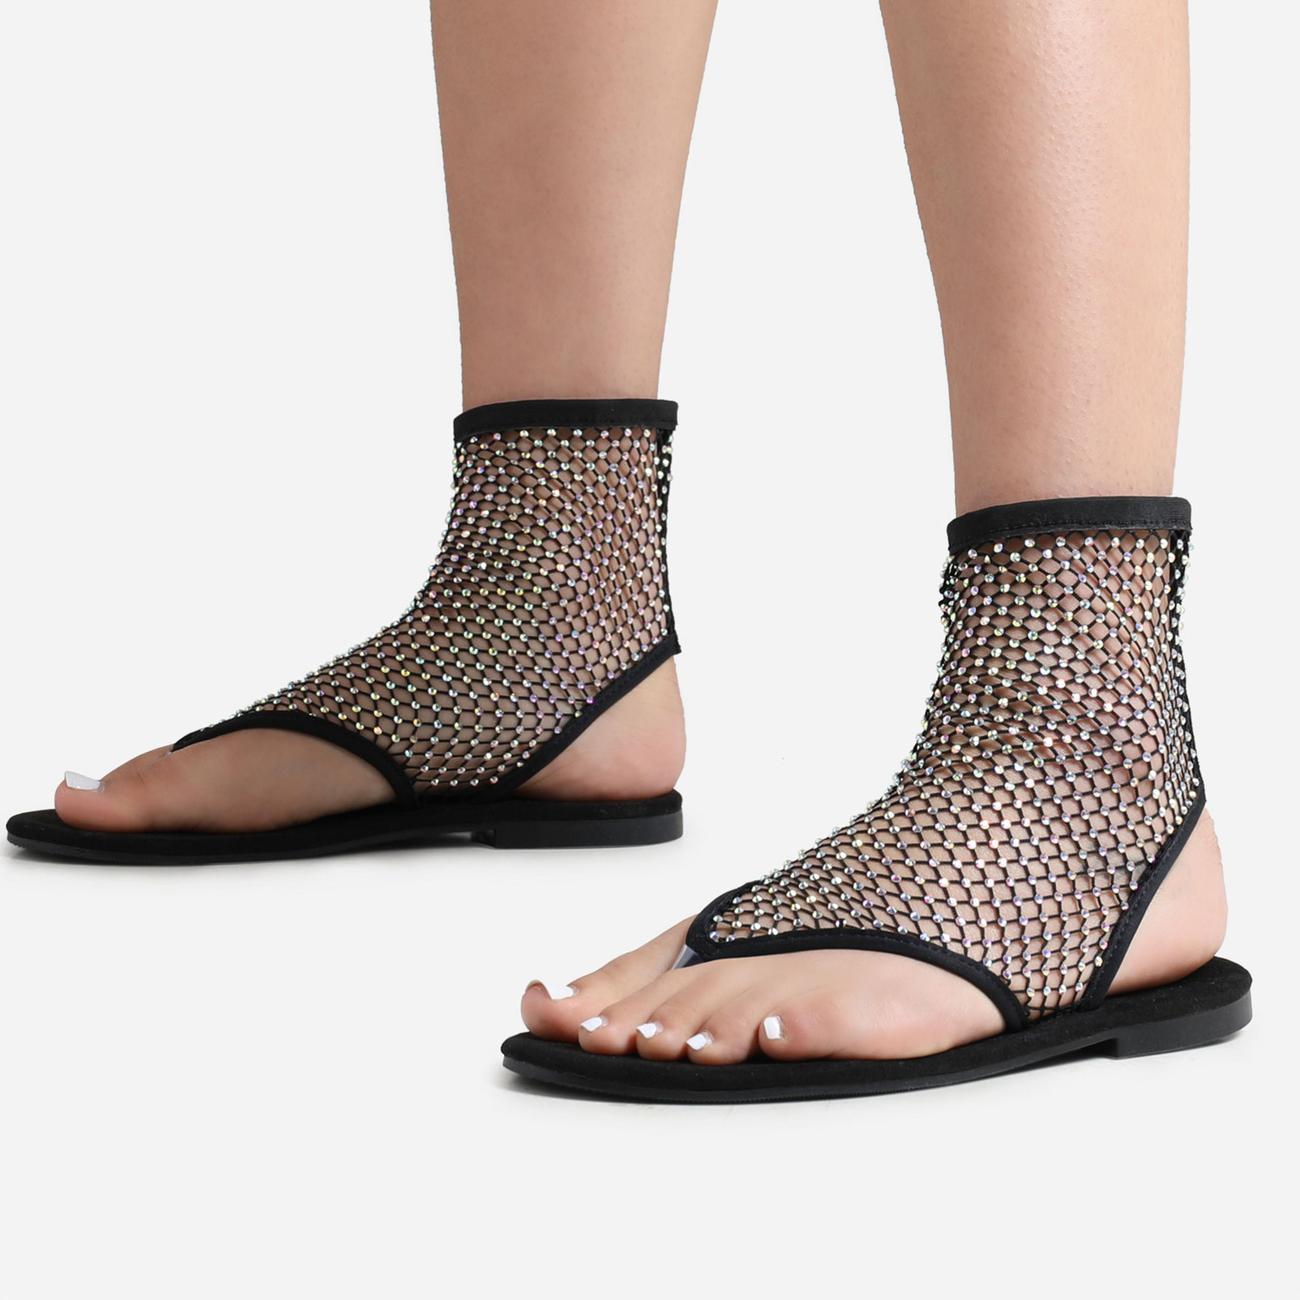 Glide Diamante Detail Ankle Flat Sandal In Black Fishnet Image 3